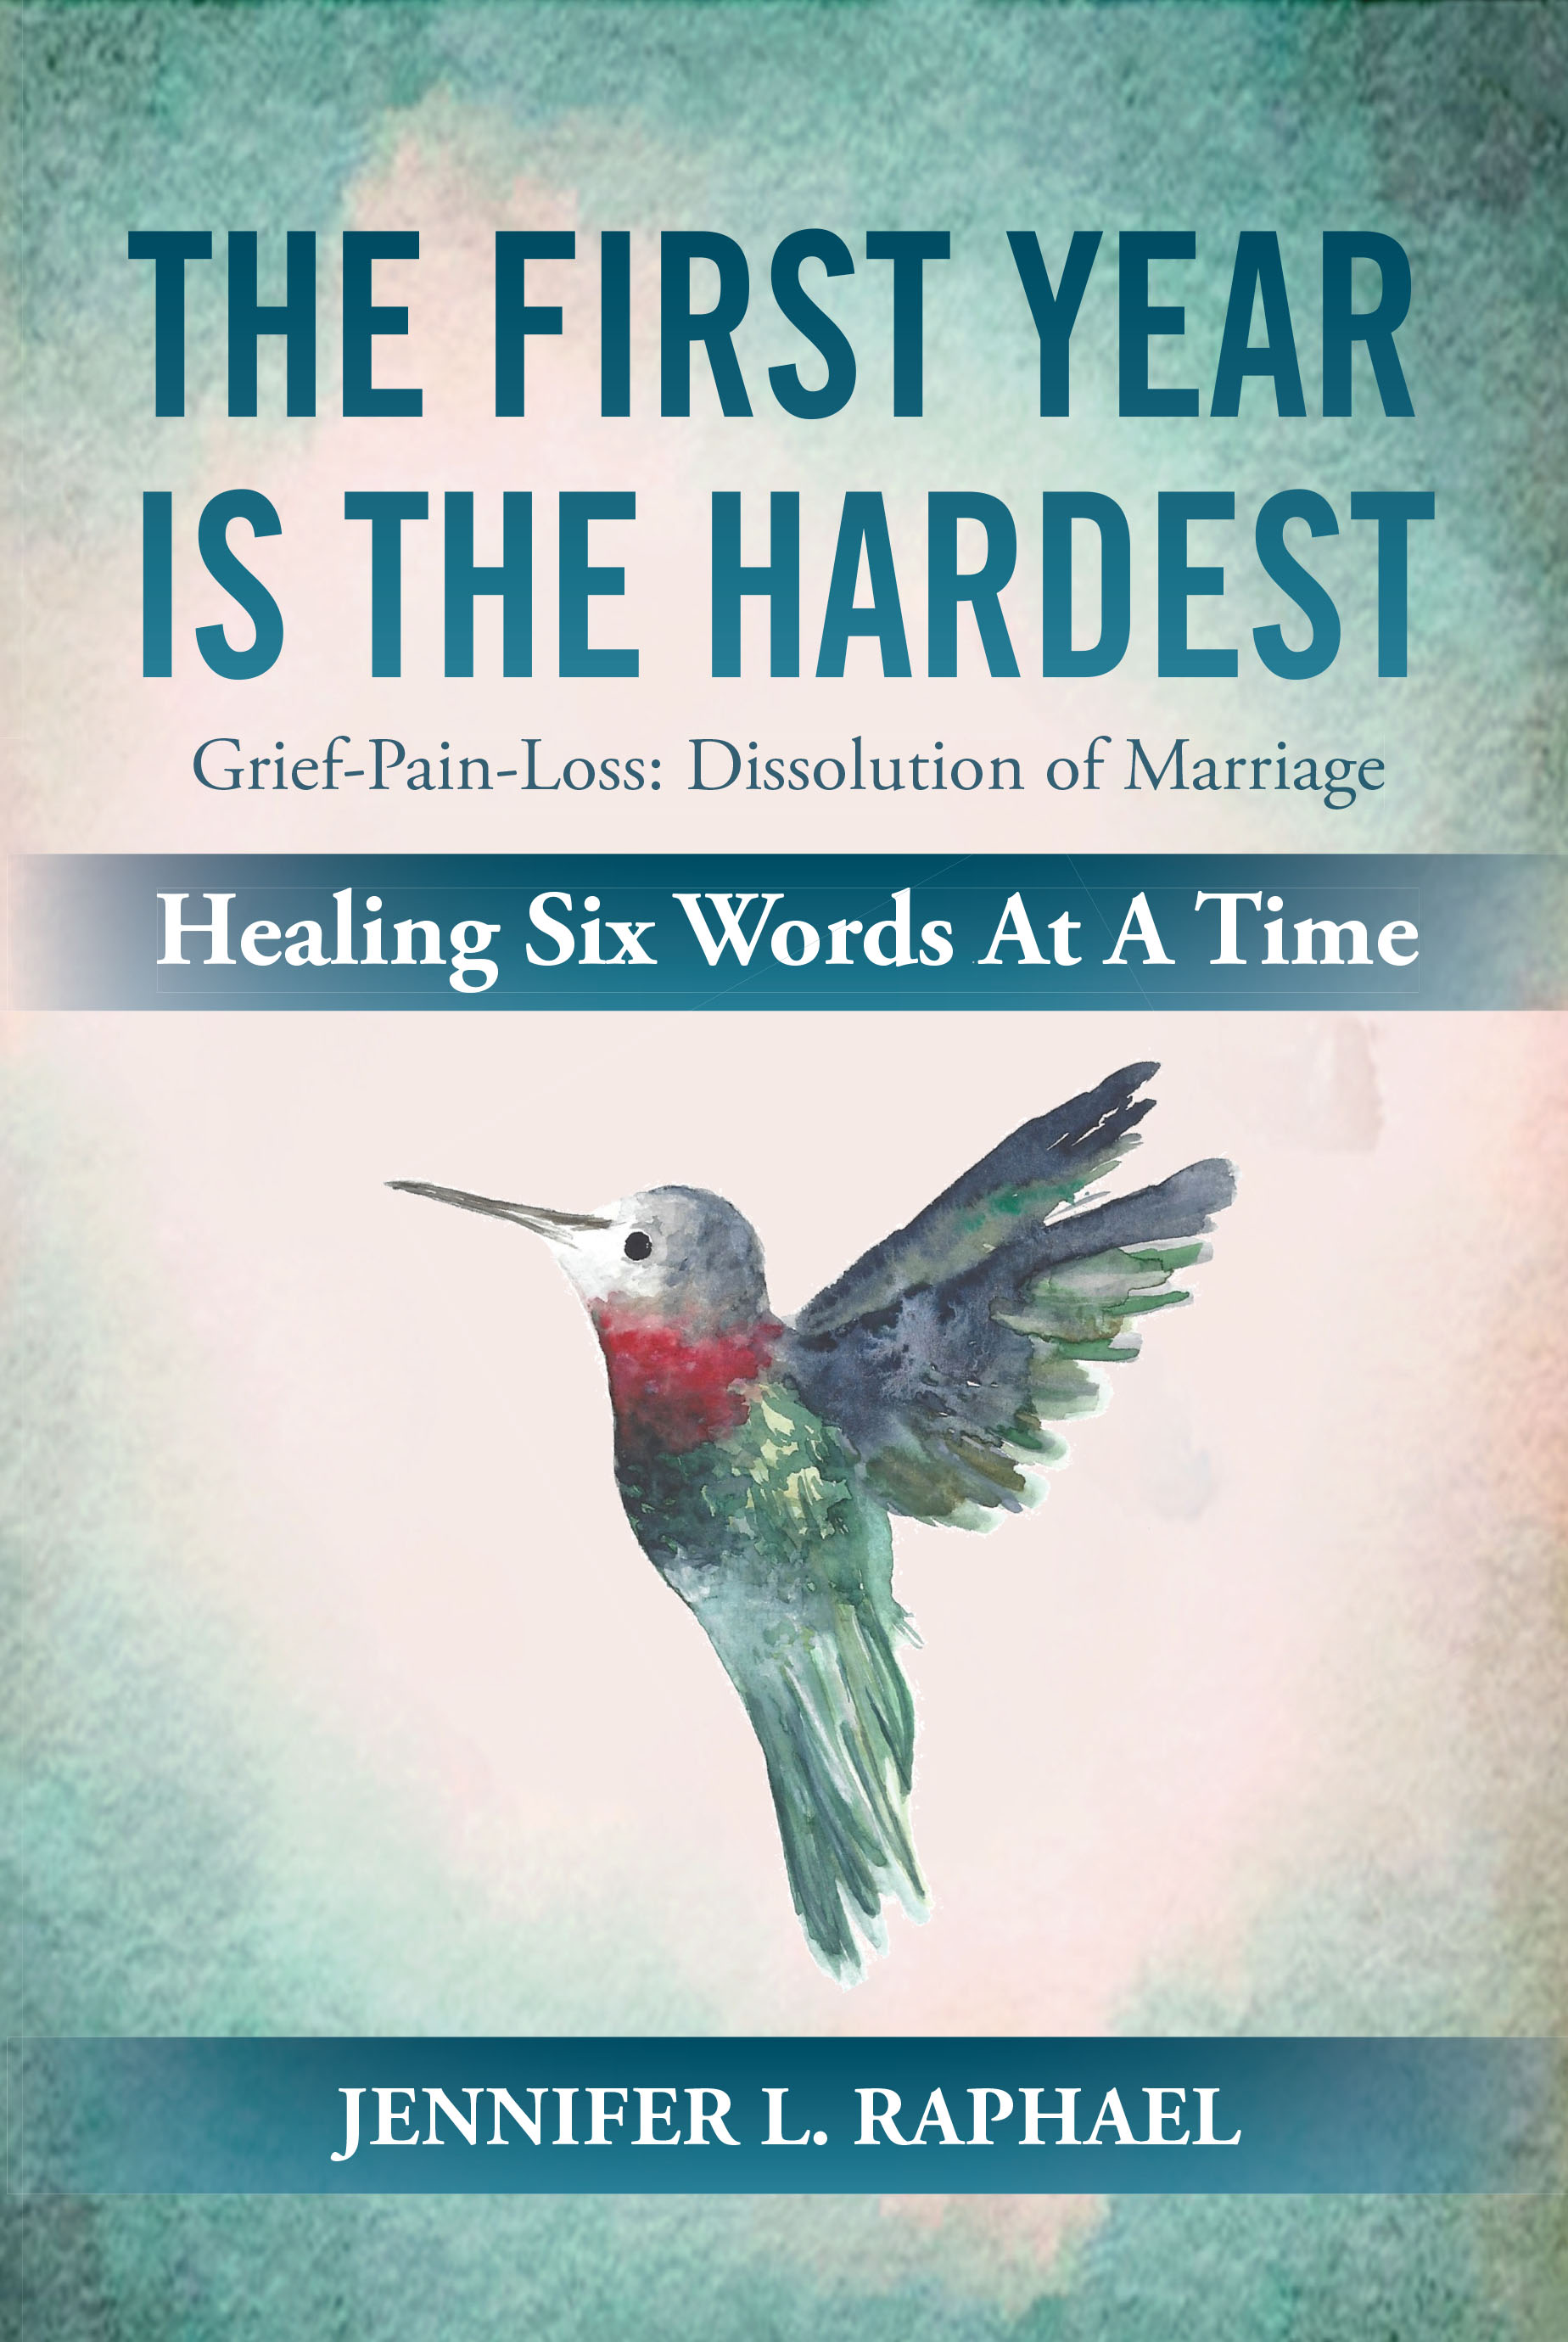 Jennifer Raphael_book cover_front only.jpg